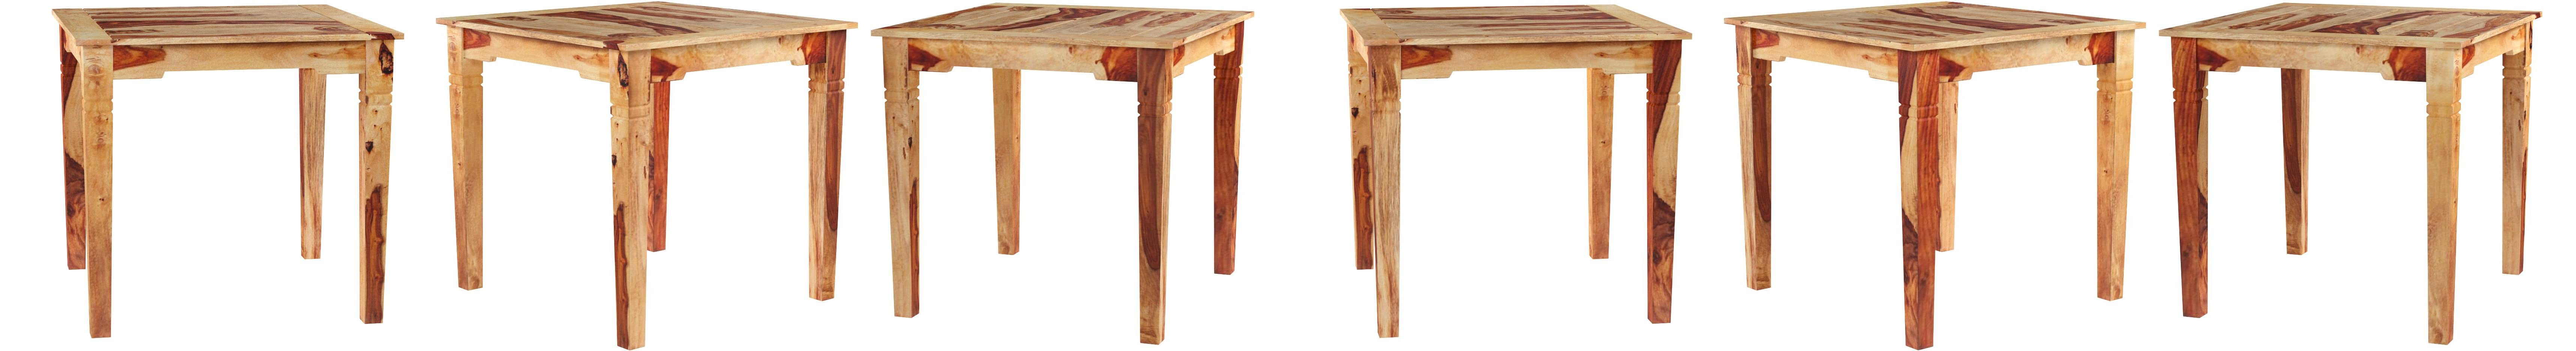 vidaXL Tavolo da Pranzo in Legno Massello di Sheesham 82x80x76 cm Sala Cucina